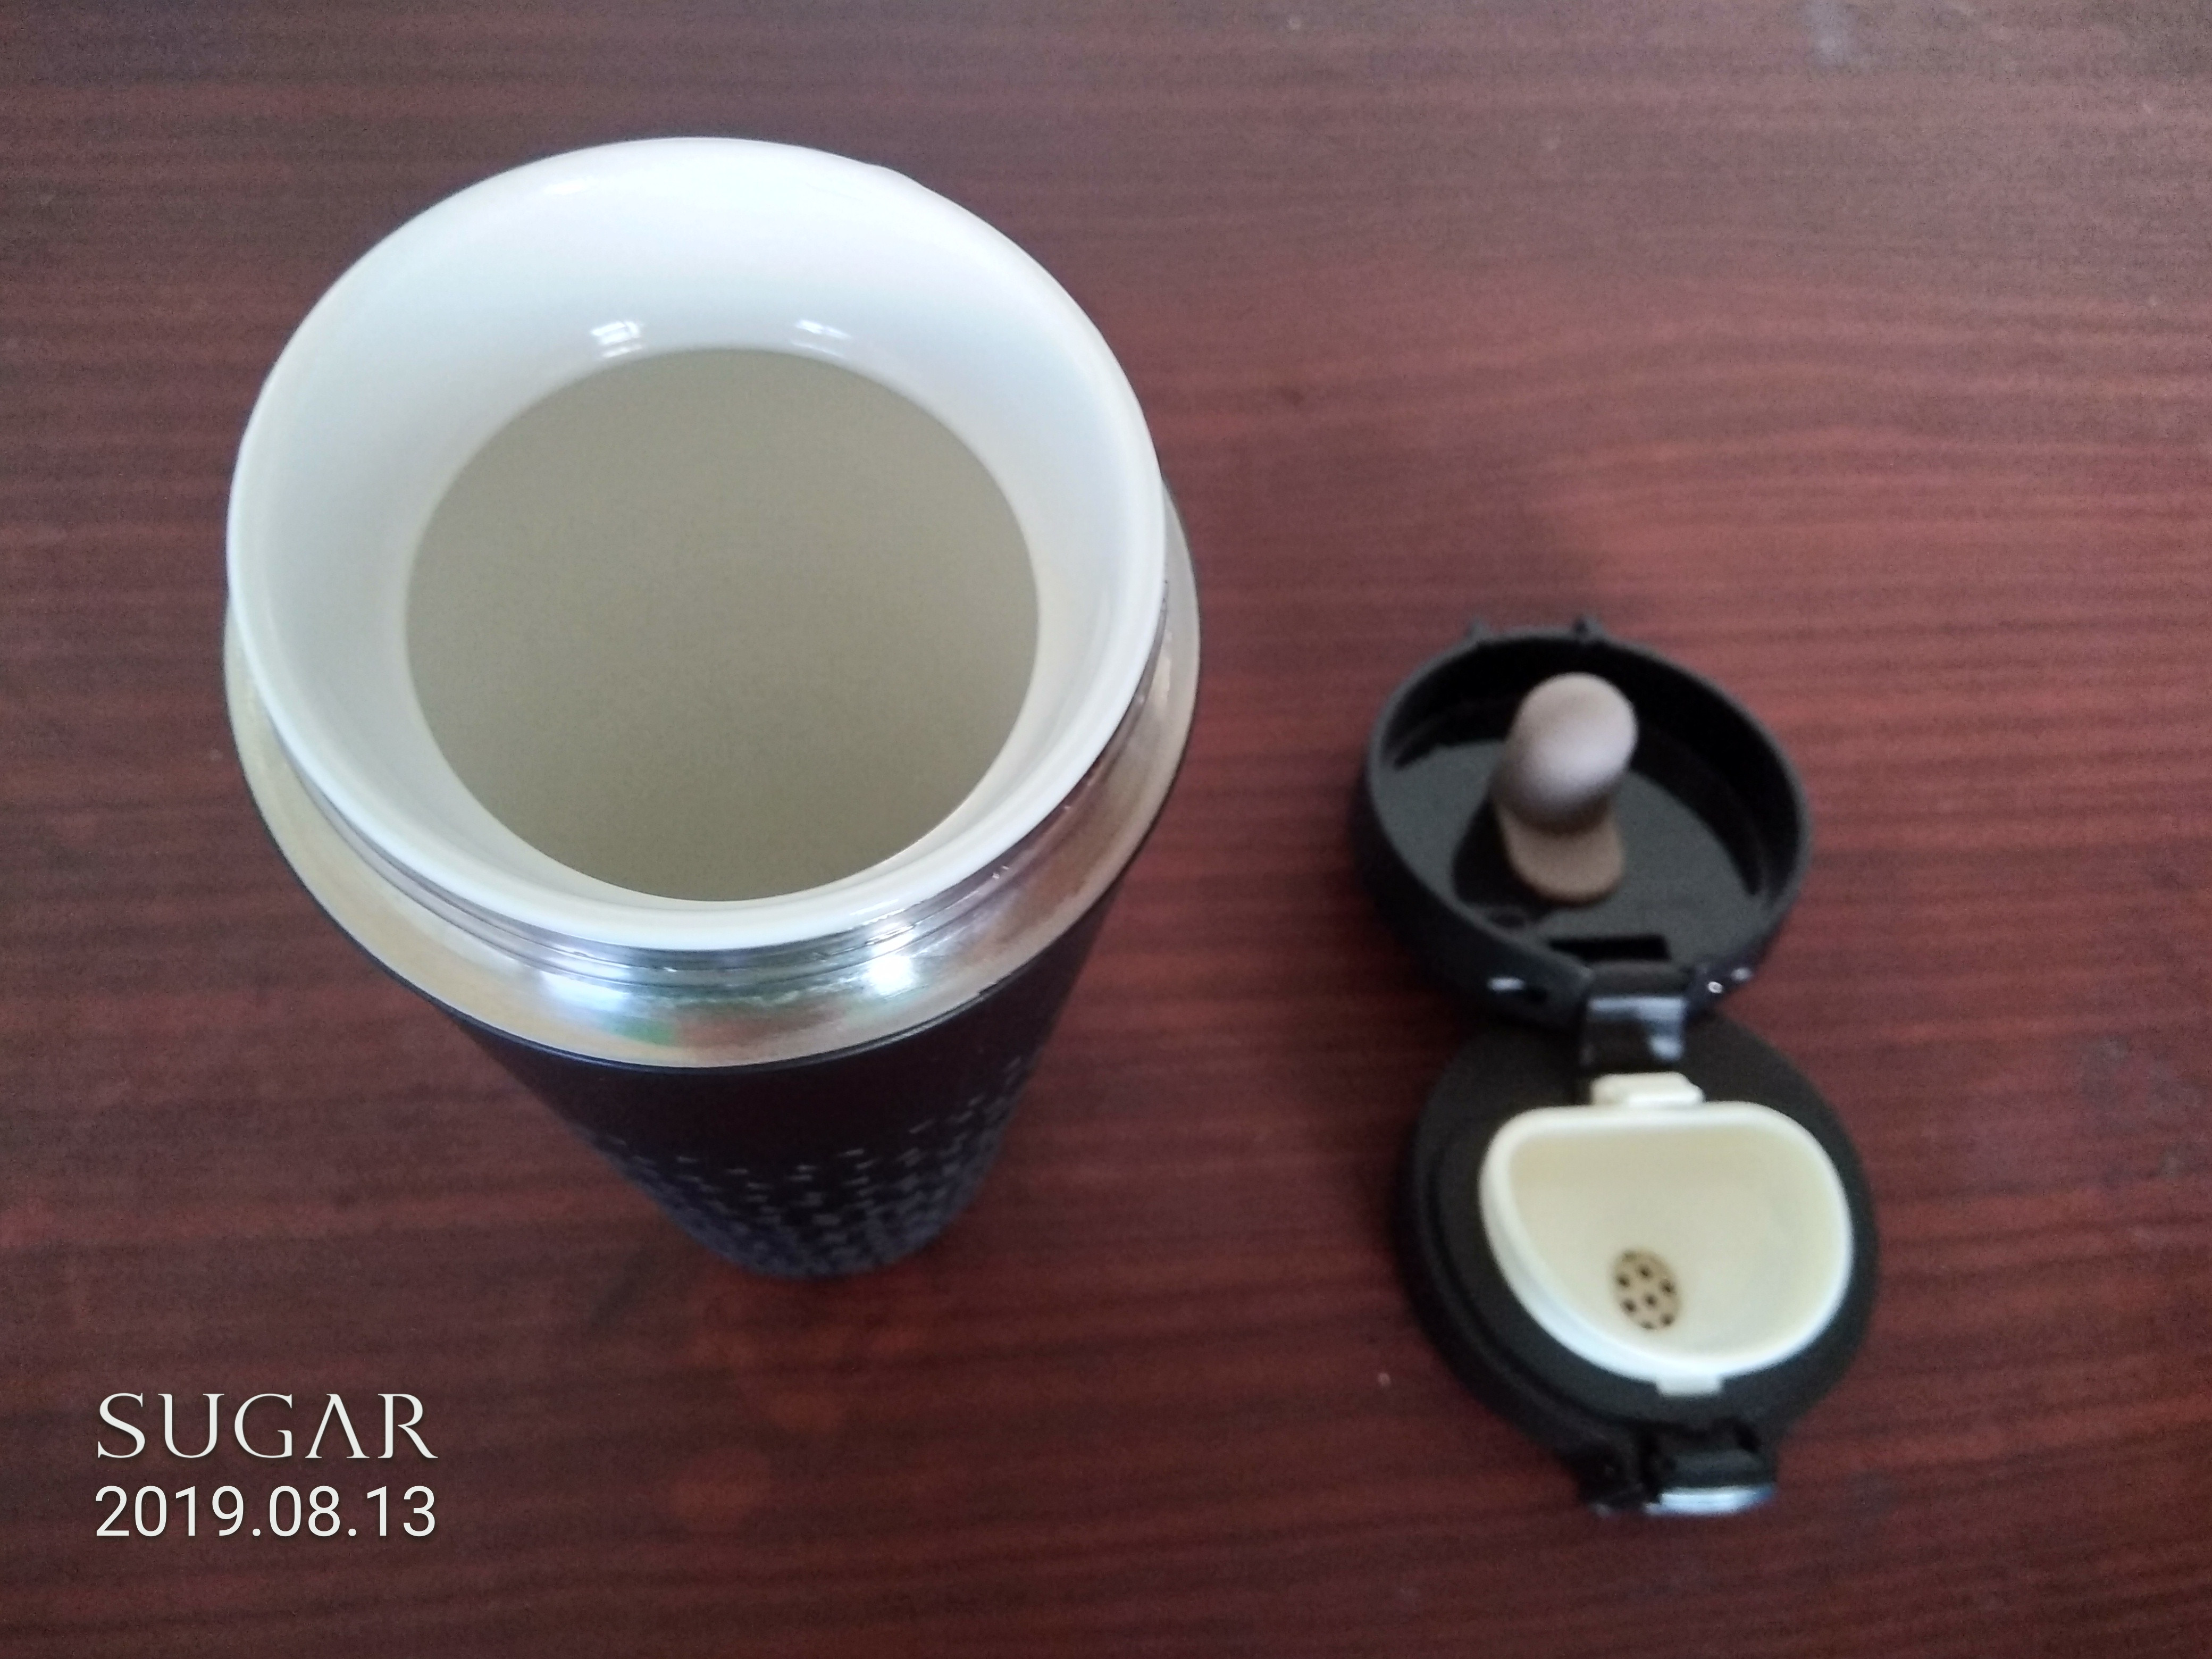 SWANZ 陶瓷保溫彈跳杯豐富您的水份,常喝水最健康!的第 5 張圖片